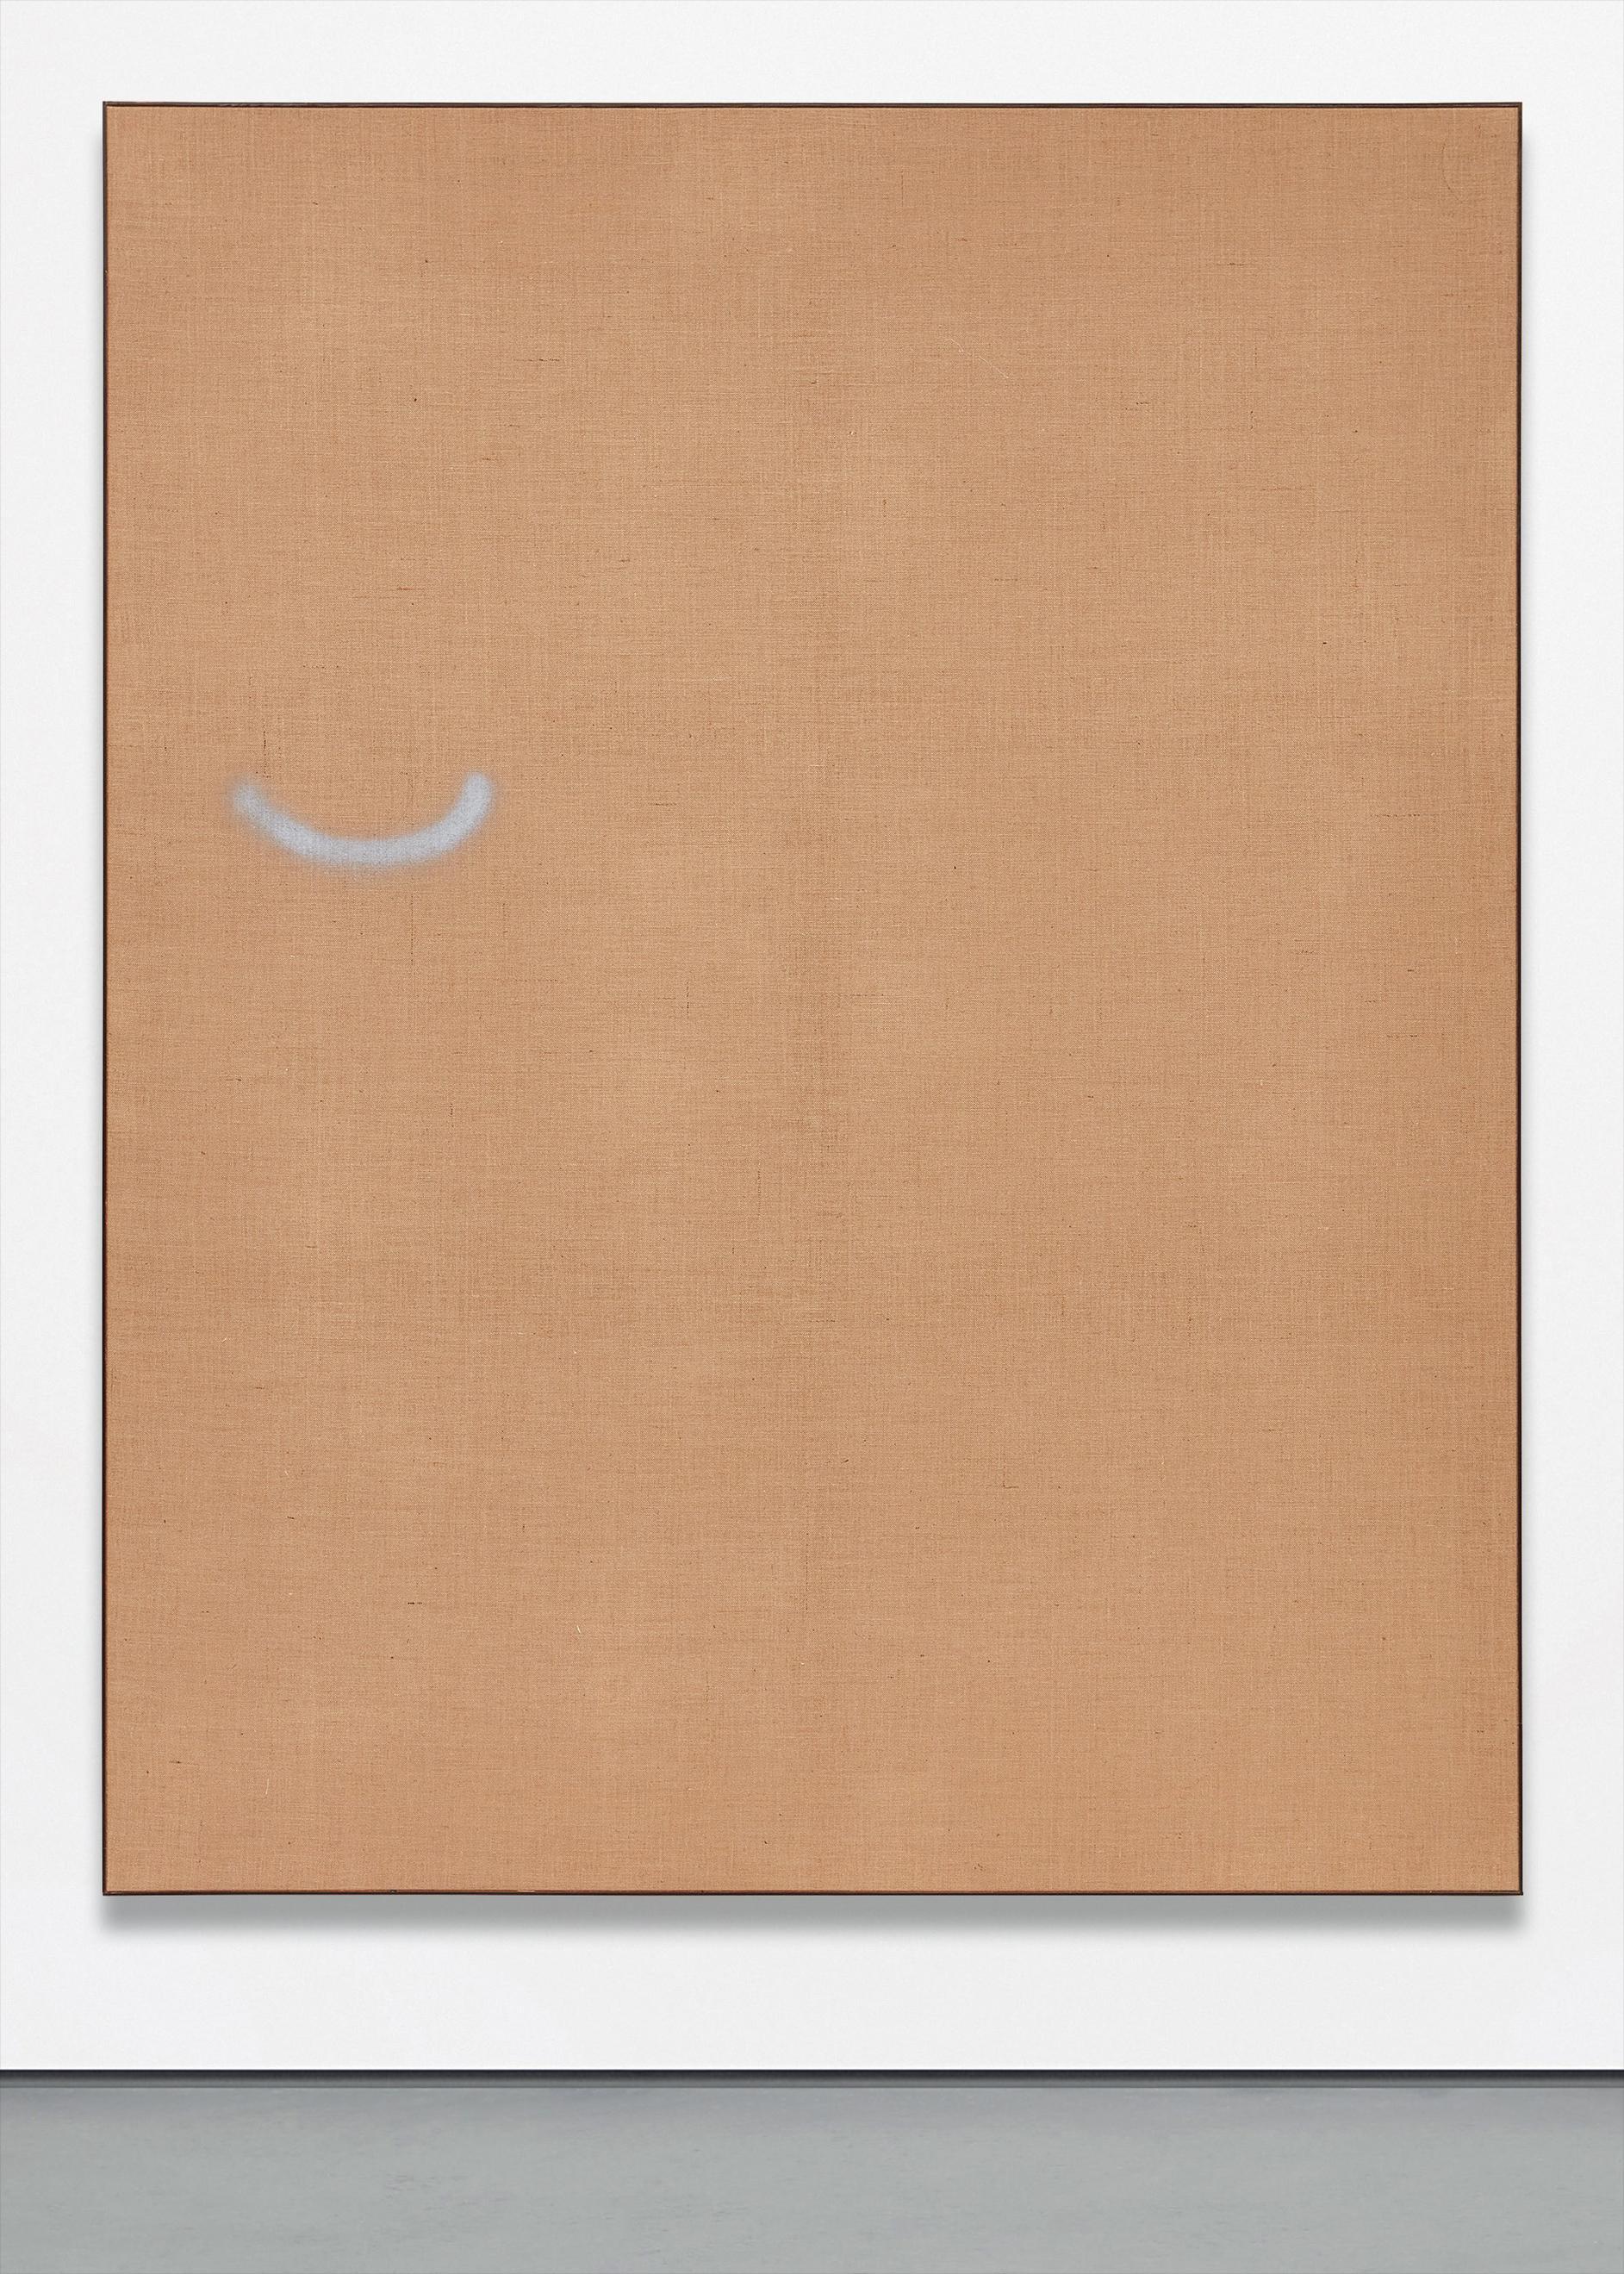 David Ostrowski-F (Dont Honk)-2014